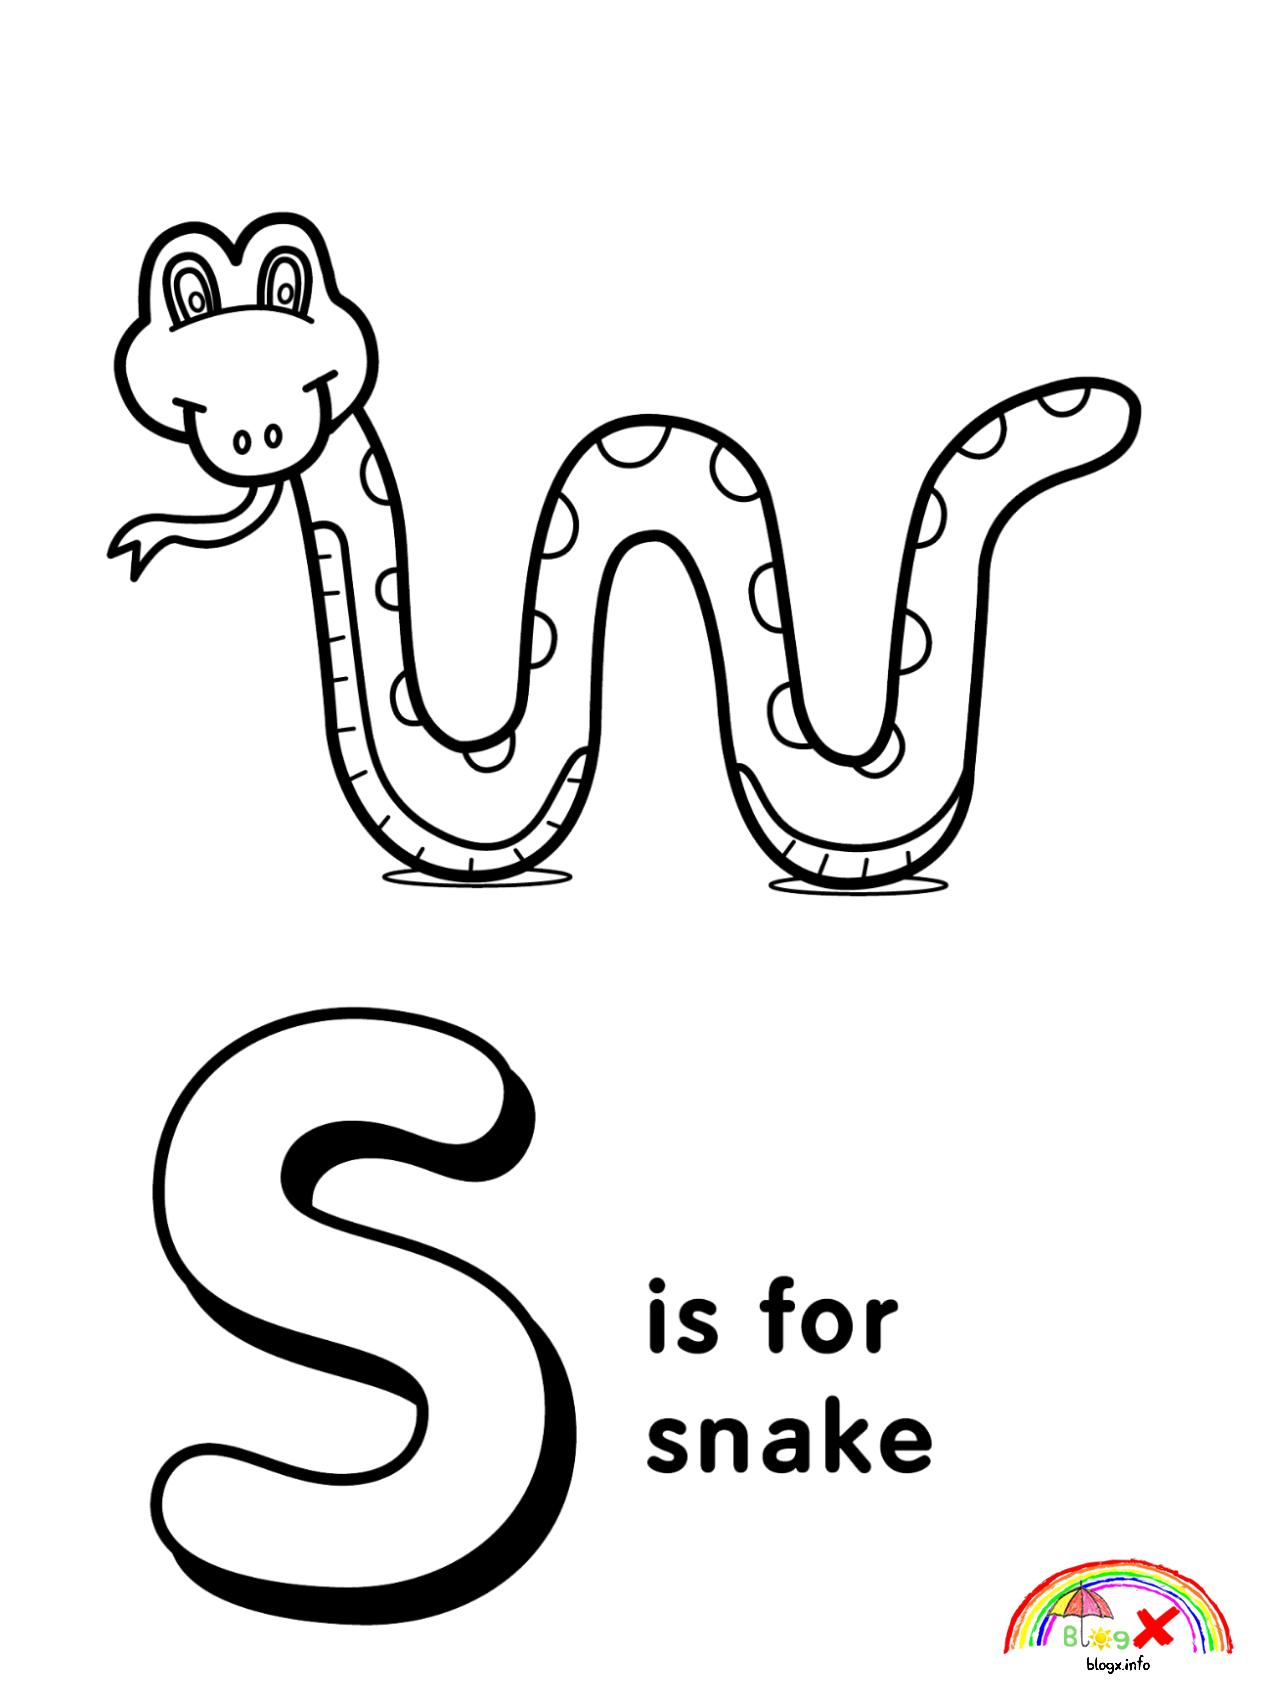 Alphabet Letter S Coloring Page Letter A Coloring Pages Snake Coloring Pages Alphabet Coloring Pages